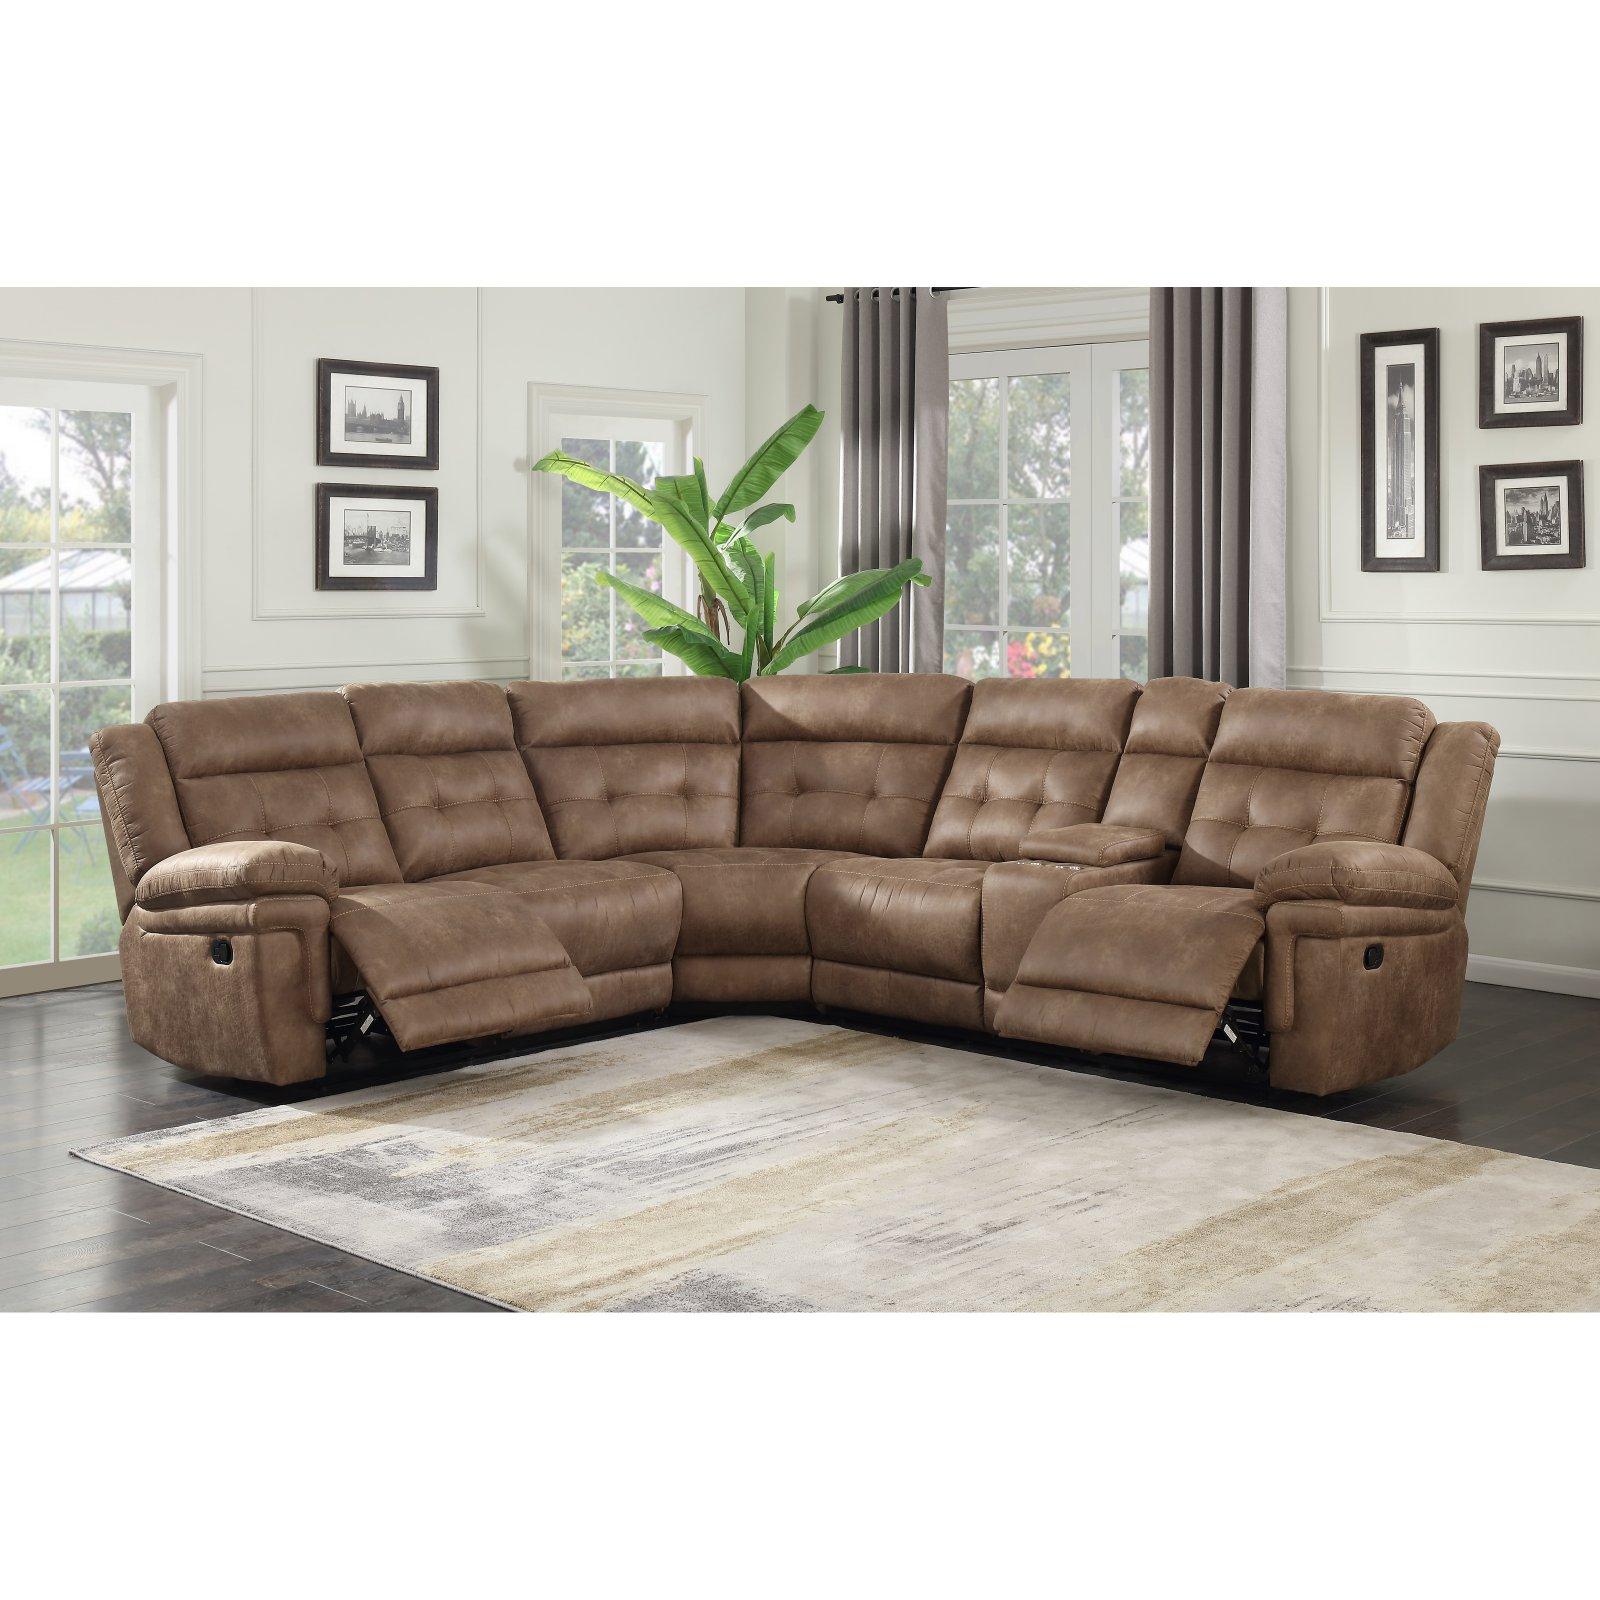 Steve Silver Co. Anastasia 3 Piece Reclining Sectional Sofa